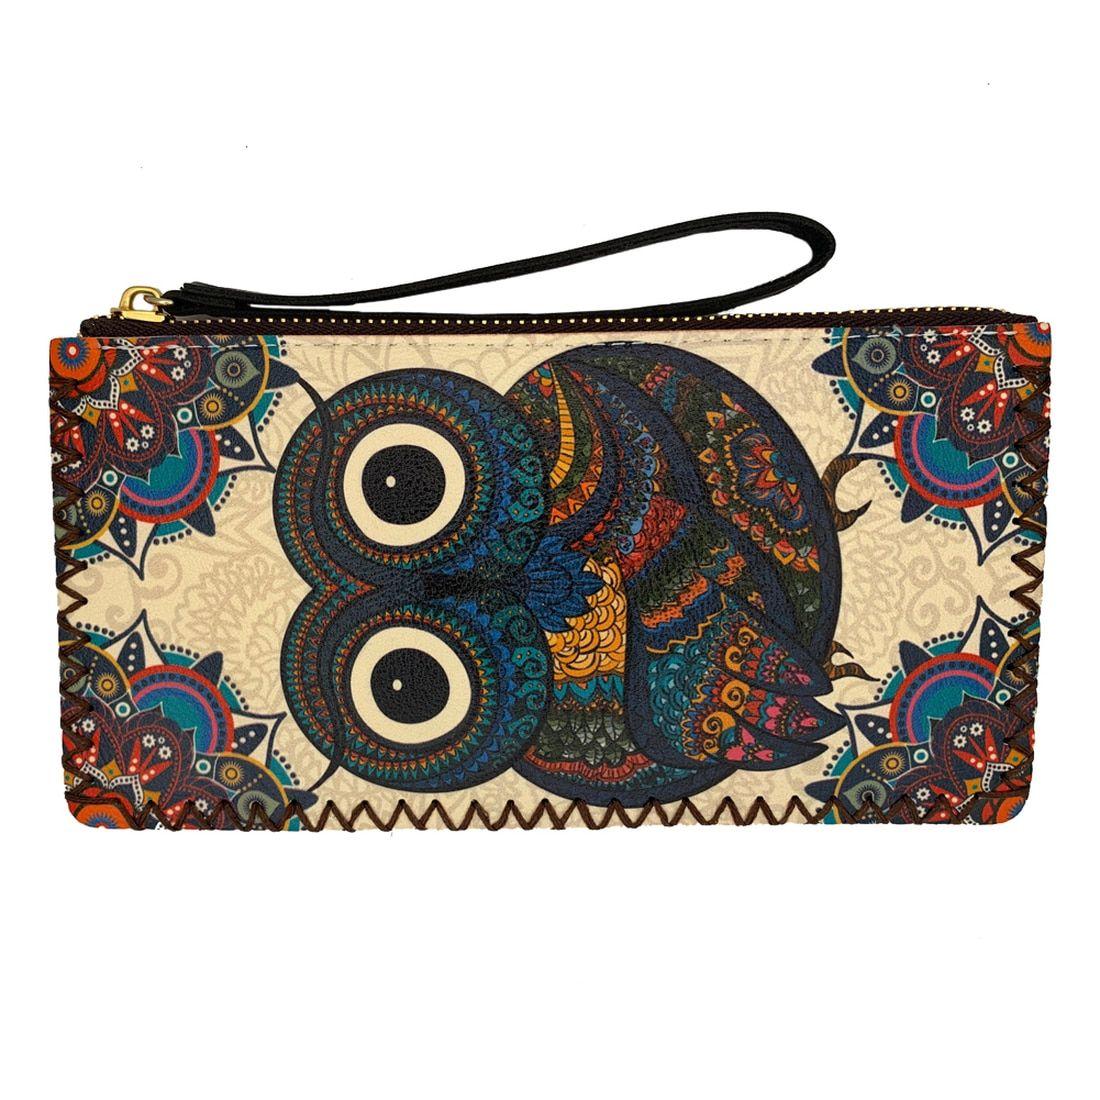 Green Skeletons Red Eyes Coin Pouch Clutch Purse Wristlet Wallet Phone Card Holder Handbag